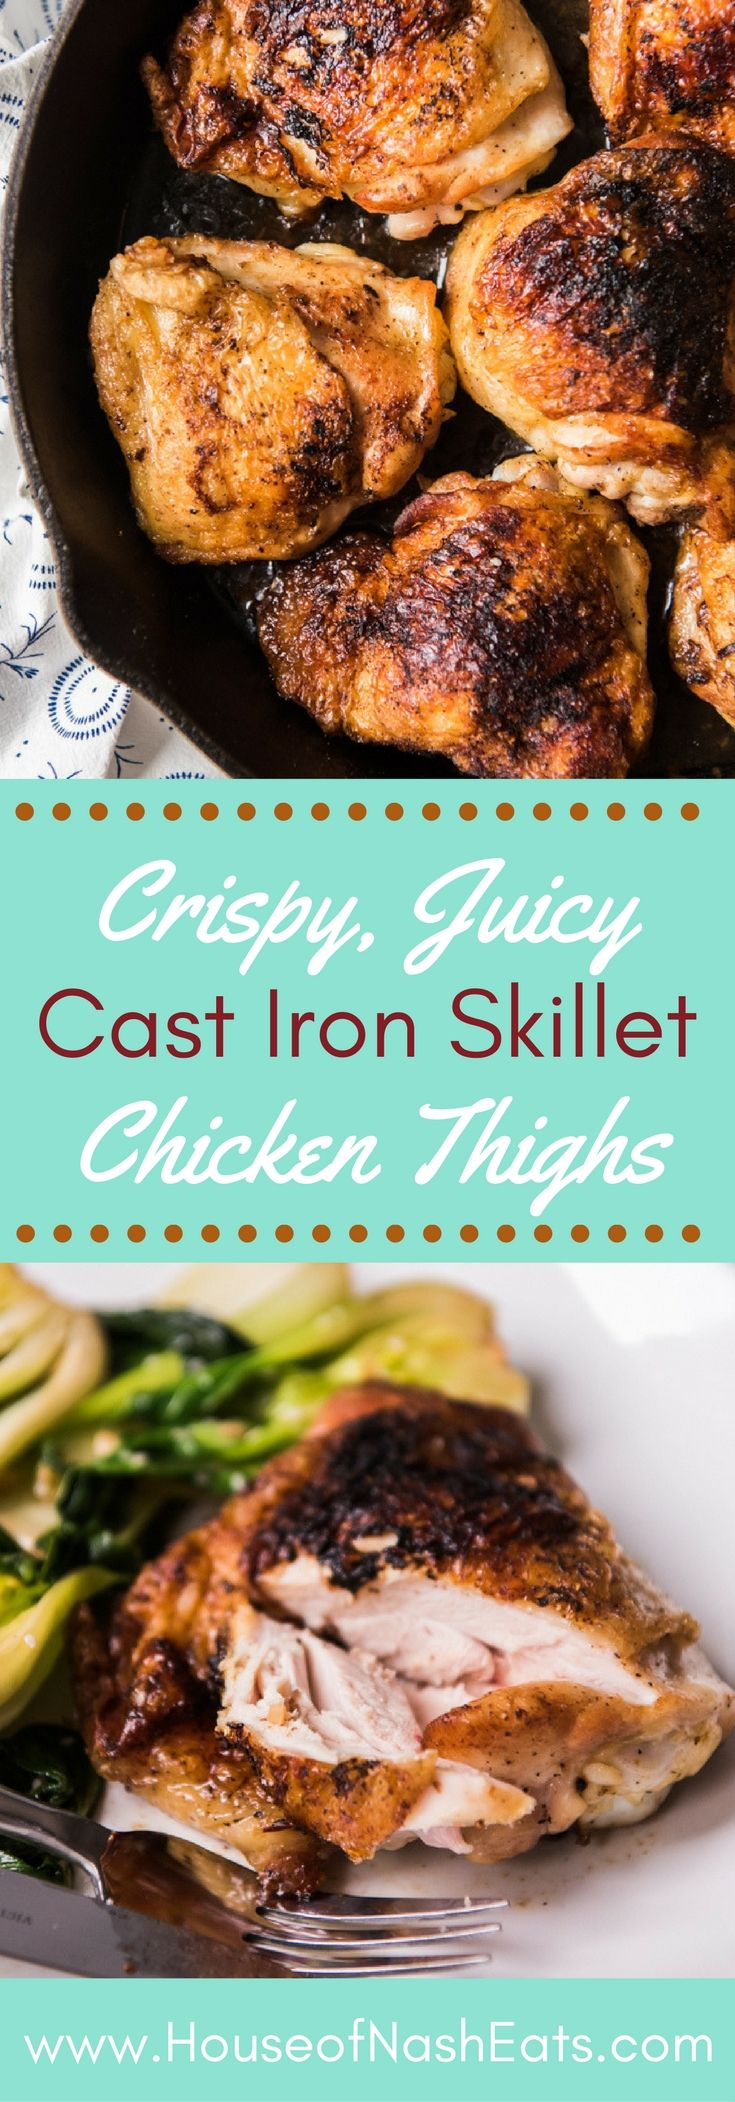 5506 best ***Blogging Friends\' Delicious Recipes images on Pinterest ...